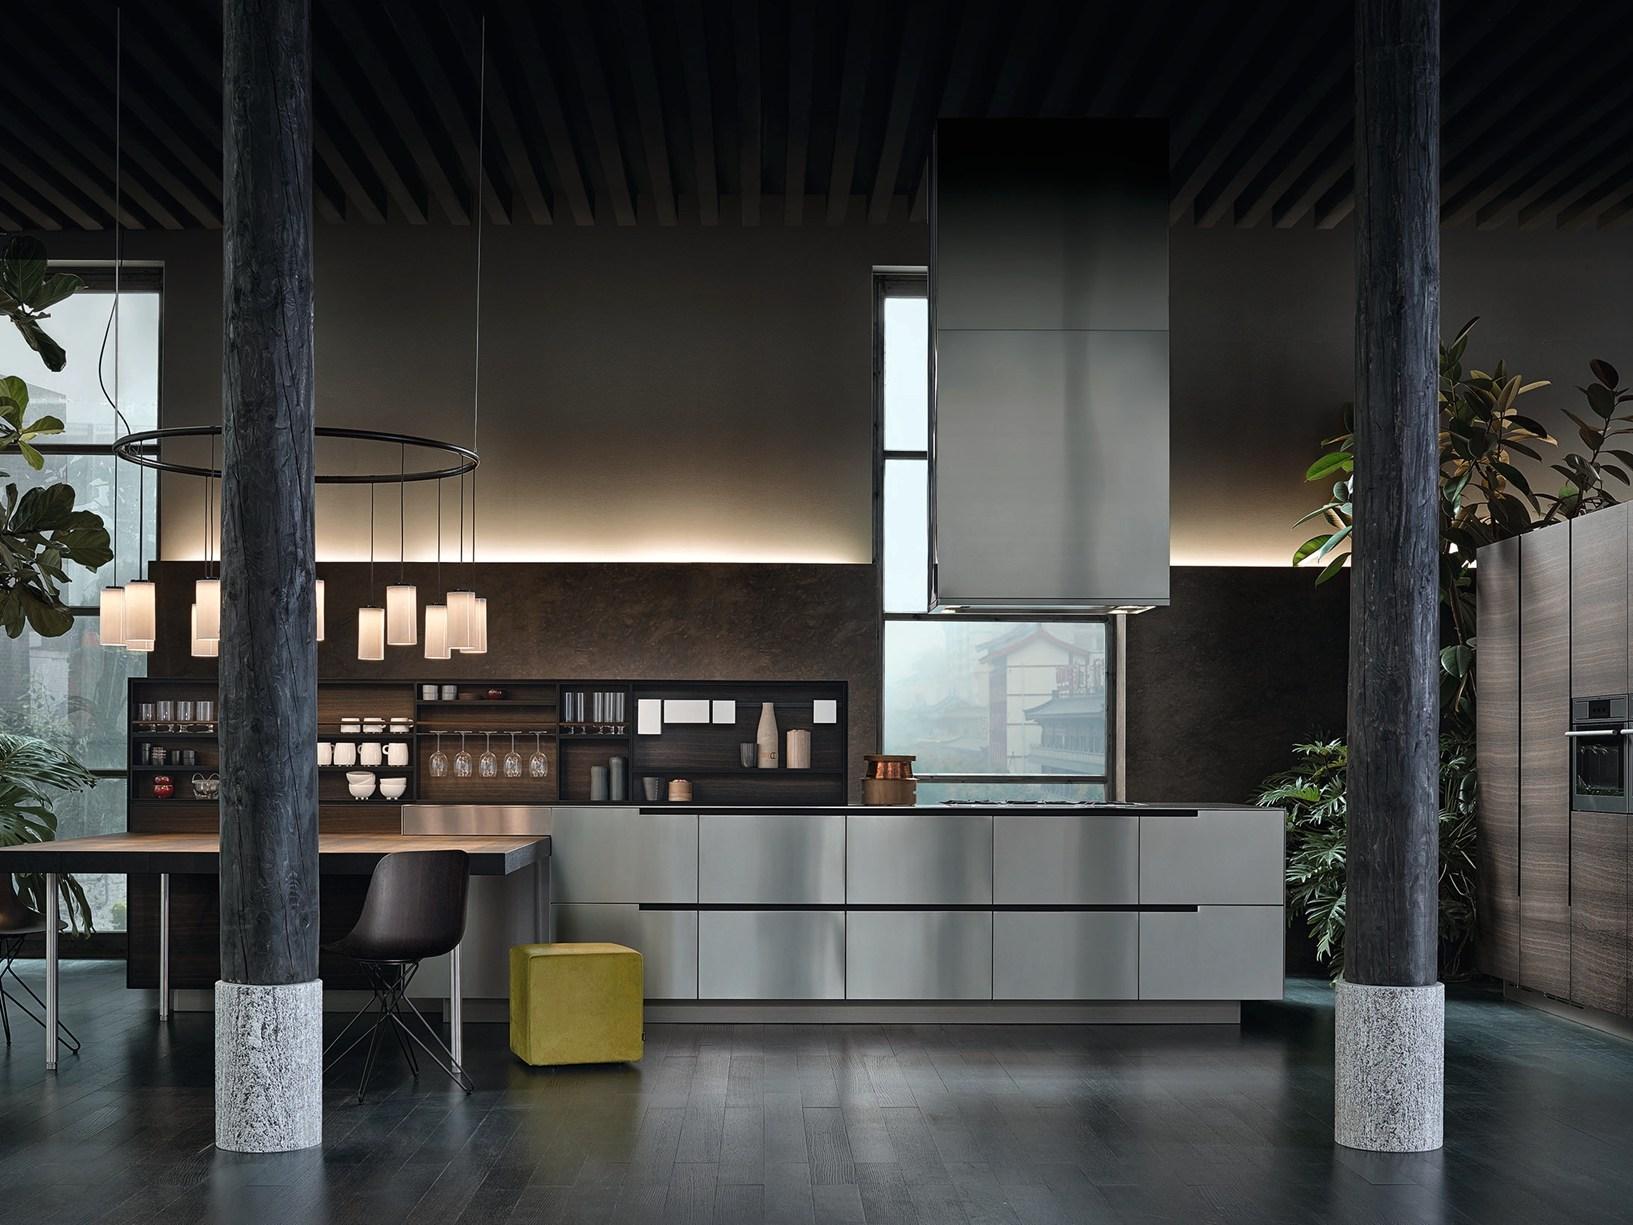 phoenix la nuova cucina varenna a eurocucina. Black Bedroom Furniture Sets. Home Design Ideas